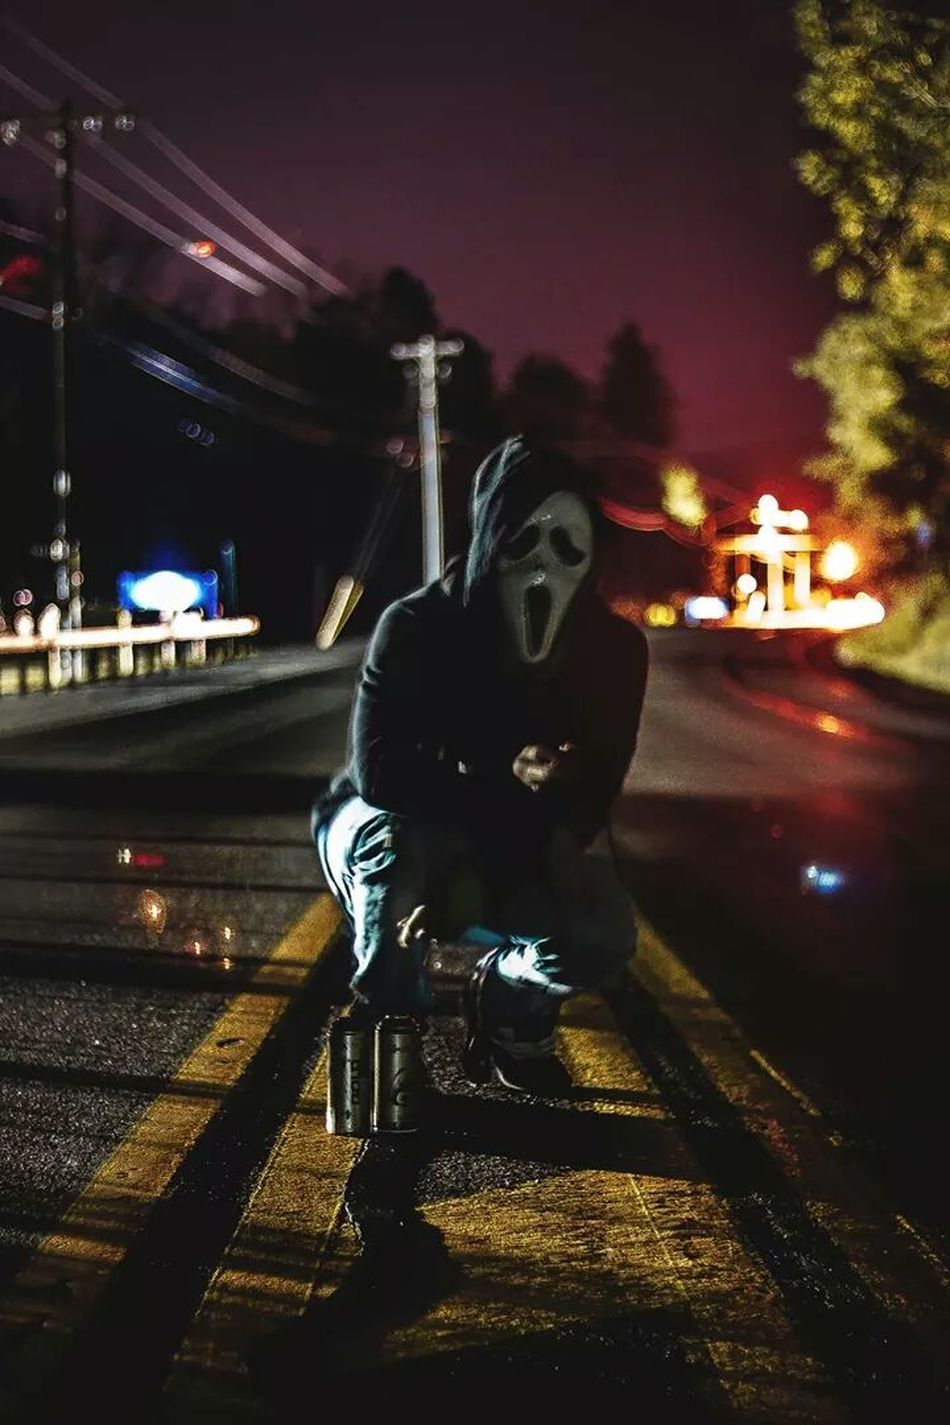 NYC Photography Streetphotography Graffiti Vagrancy